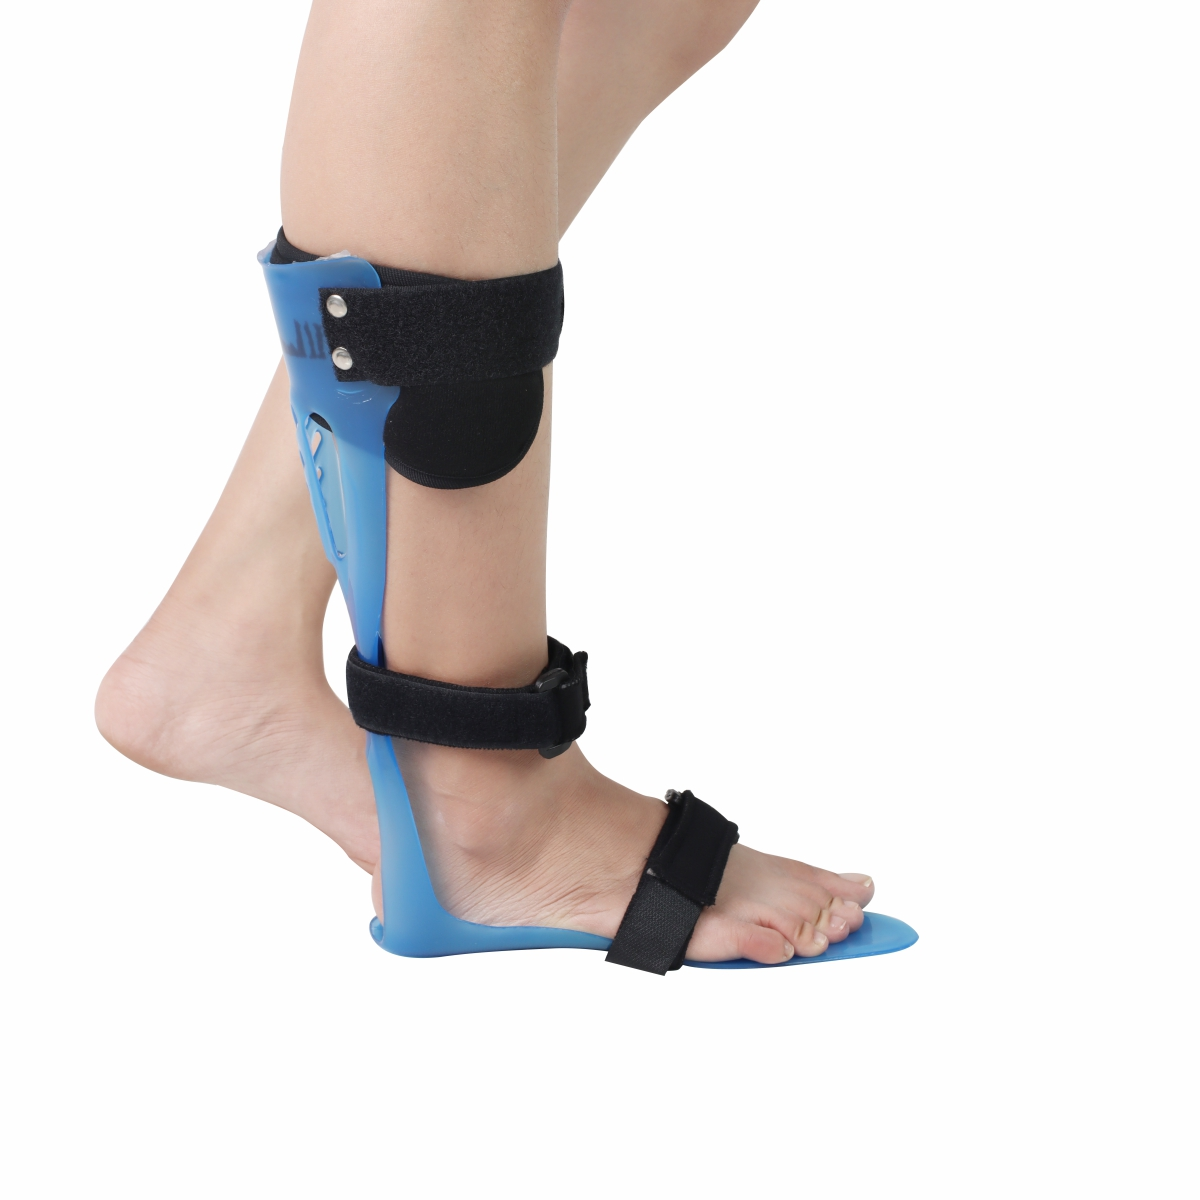 Nẹp chân nhựa poly propylene United Medicare (D07)